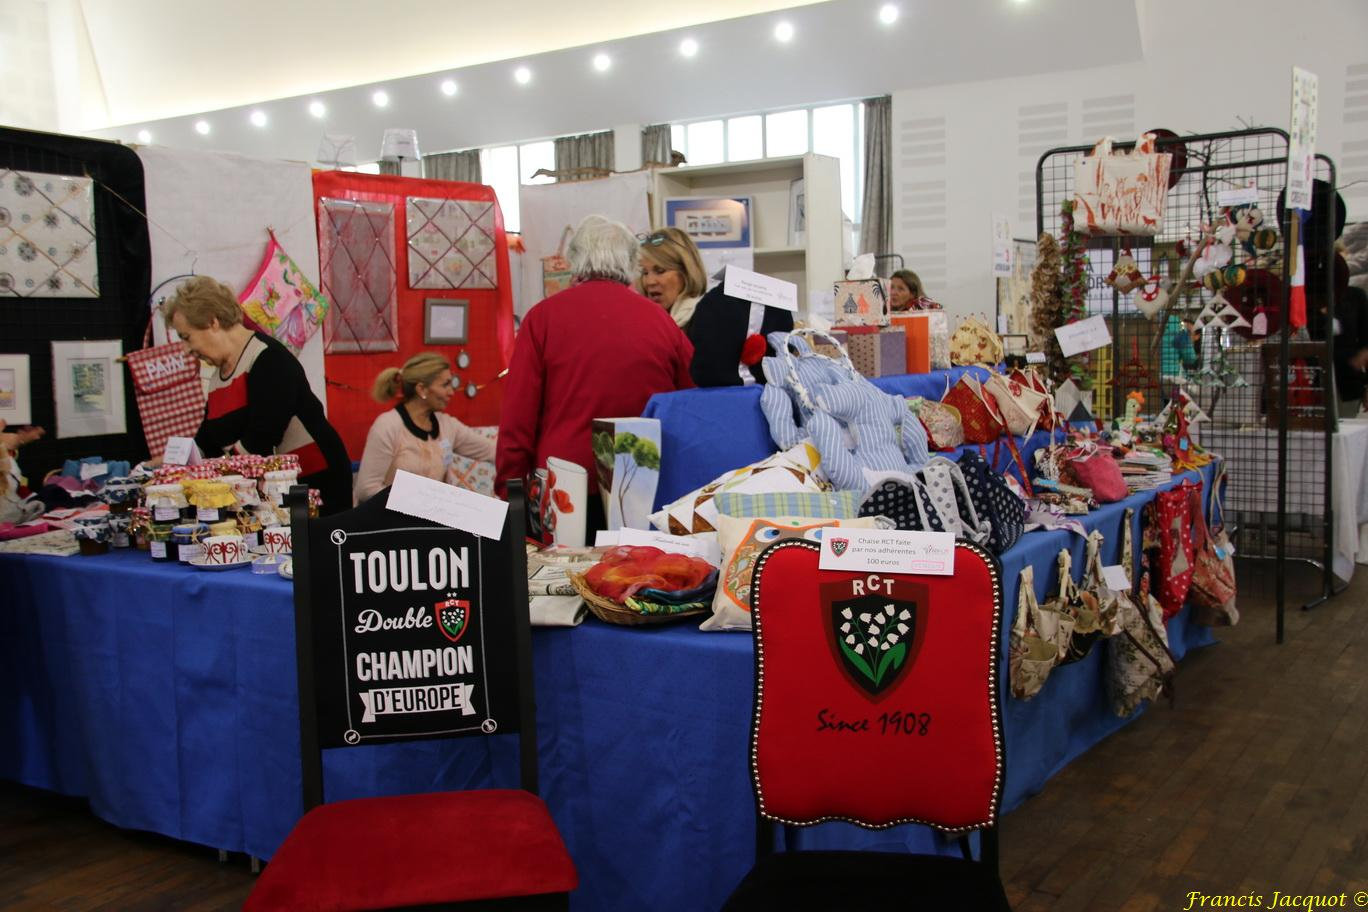 [ Associations anciens Marins ] ADOSM Toulon 2015 1556713018